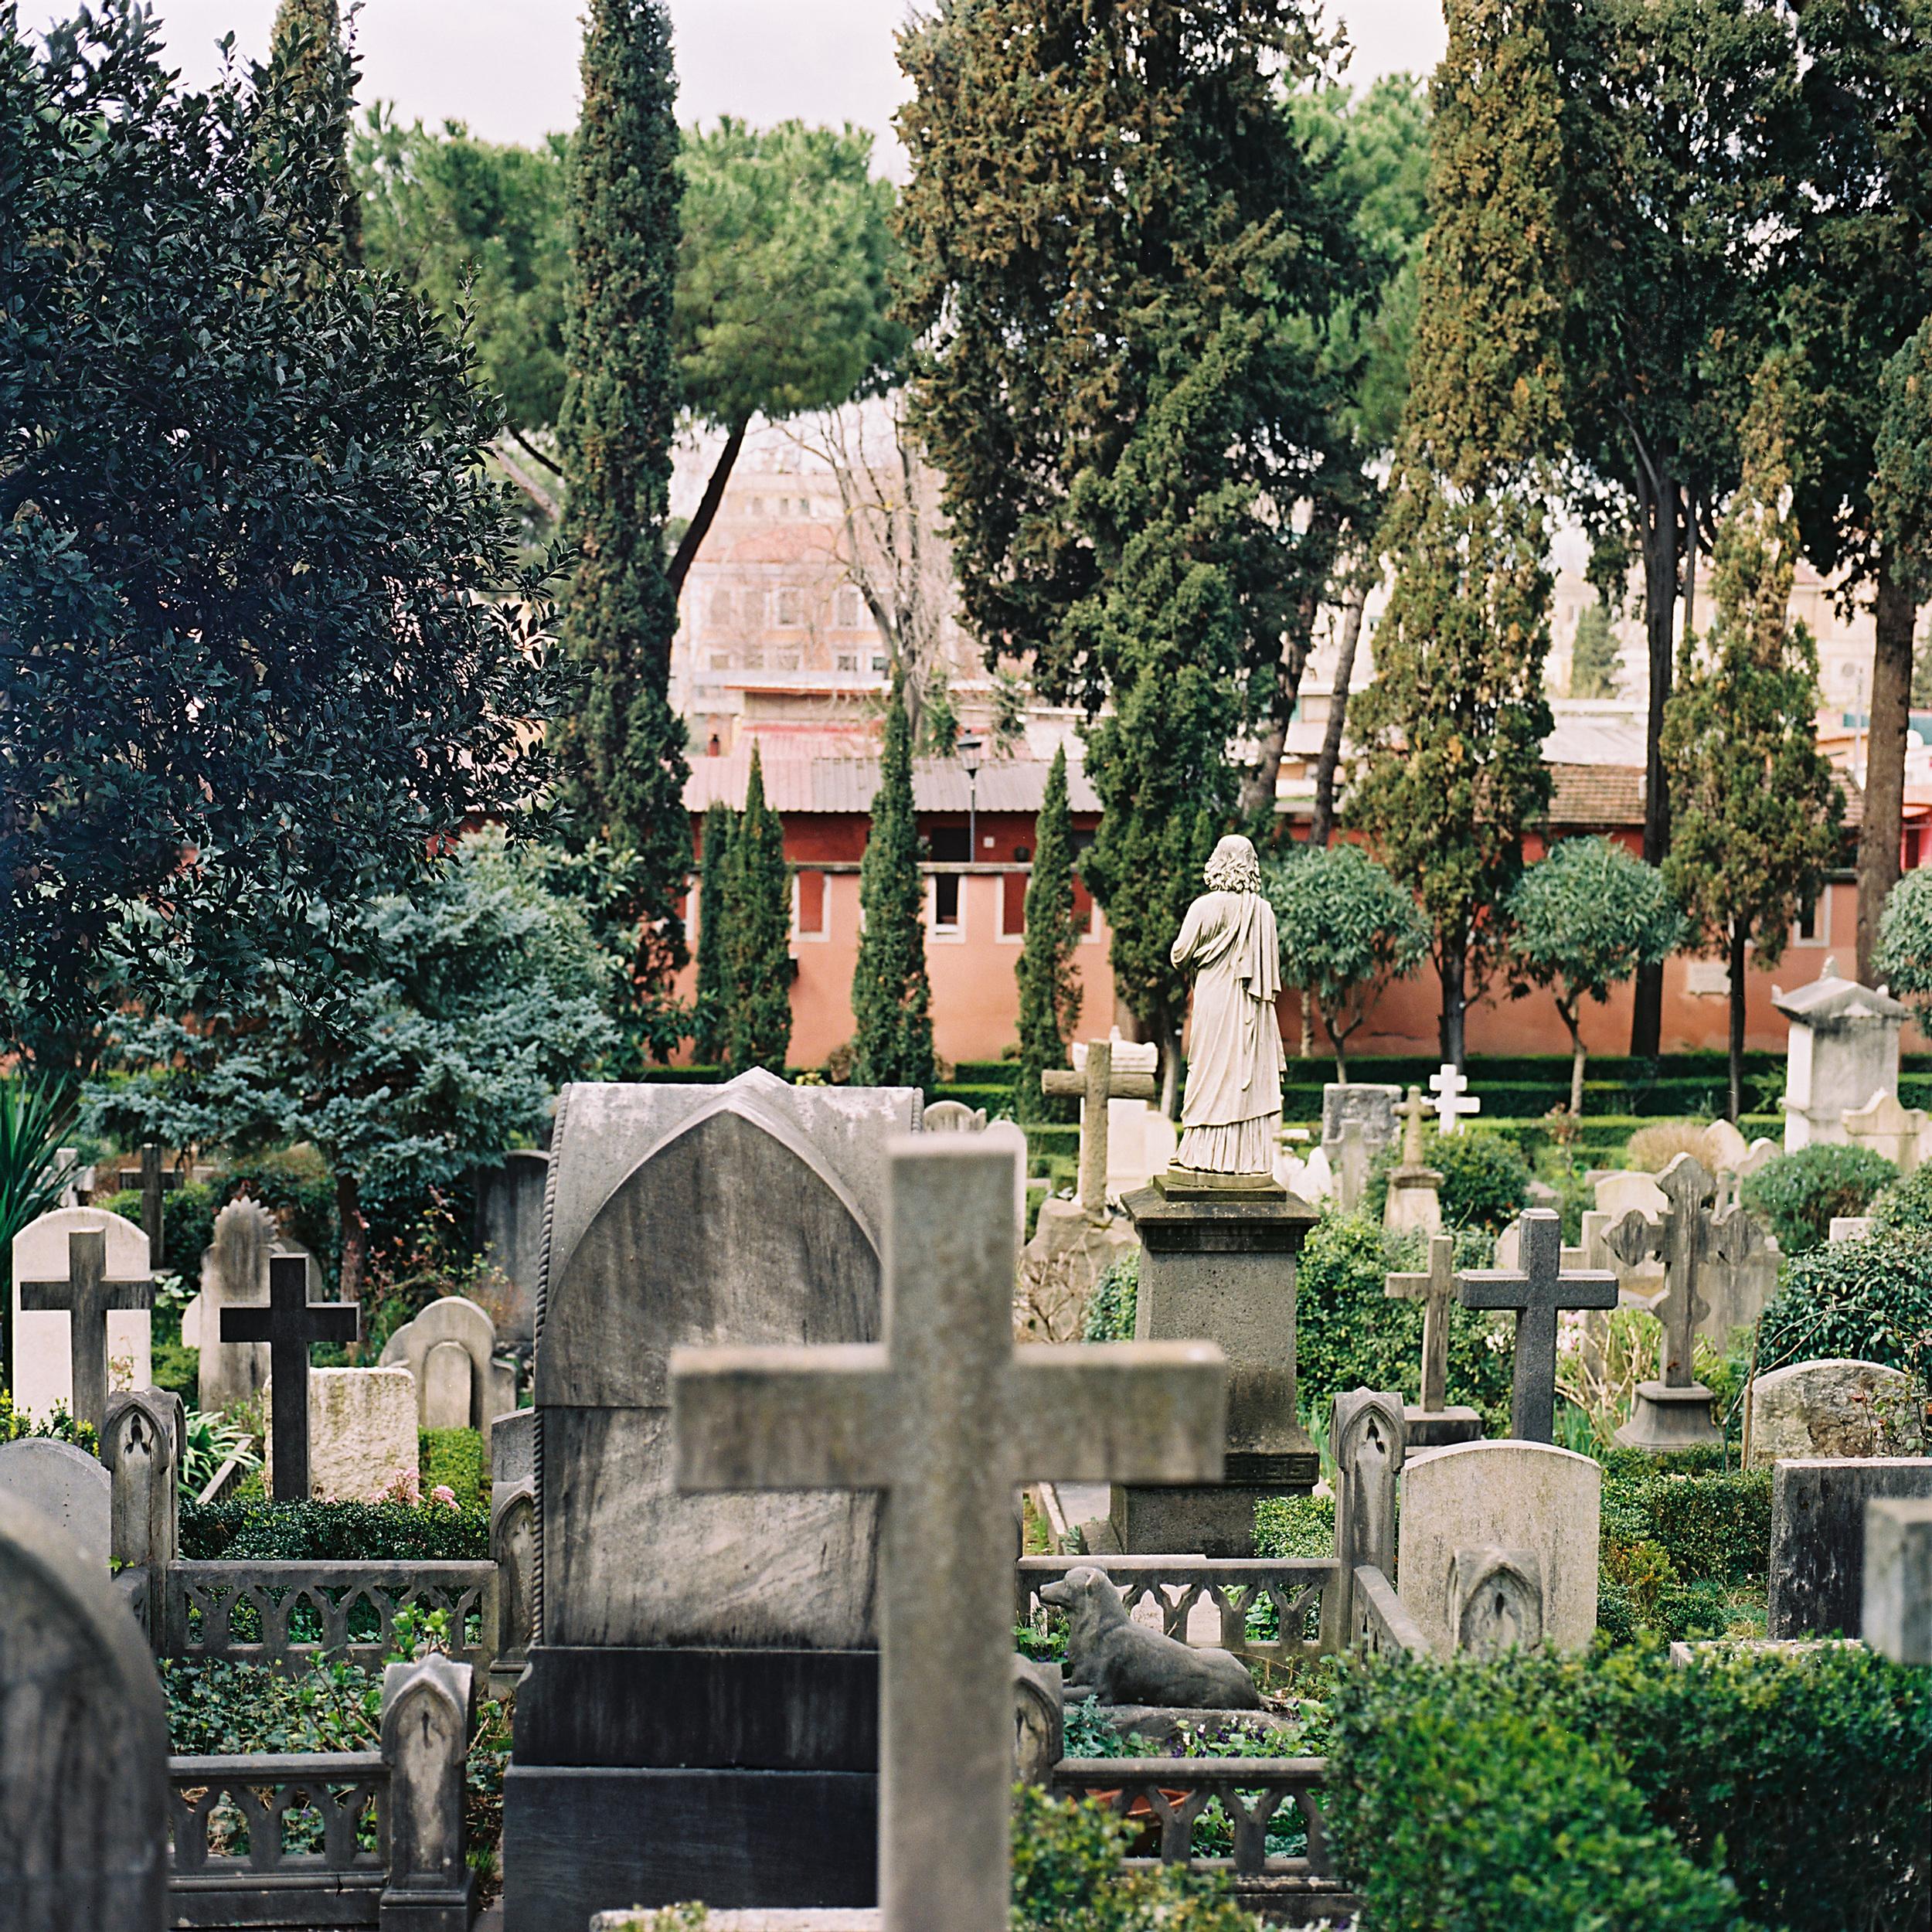 Cimitero Acattolico, Rome, 2015